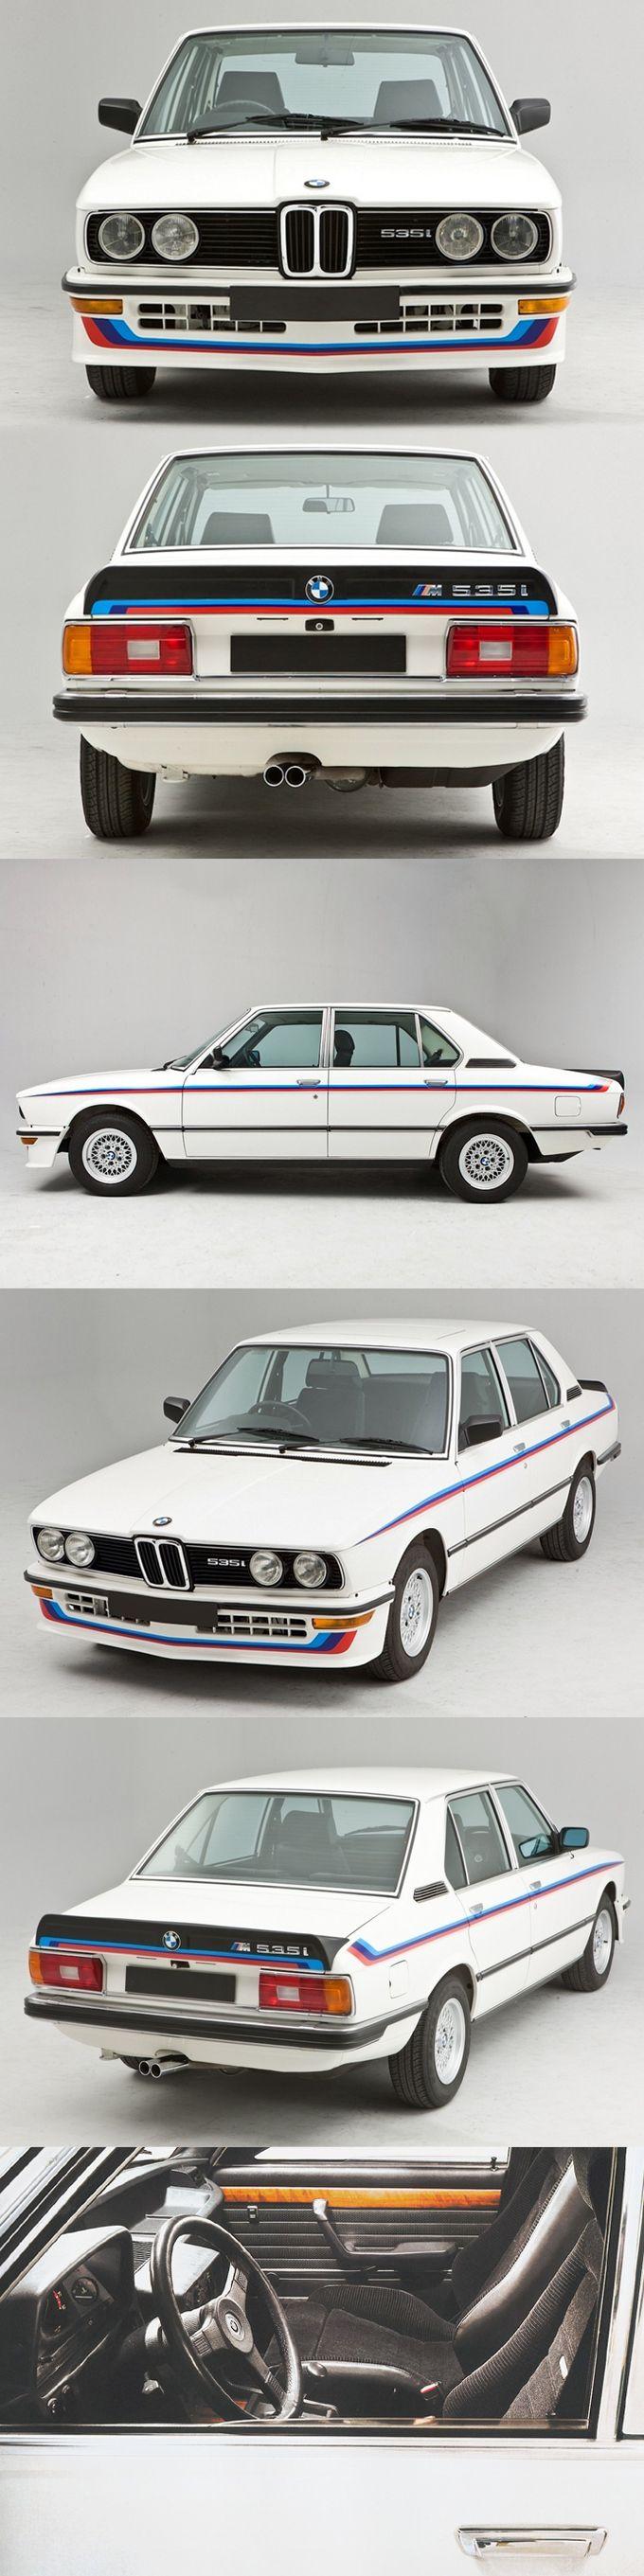 1980 BMW M535i / Motorsport / white blue red / Germany / 17-209 ...